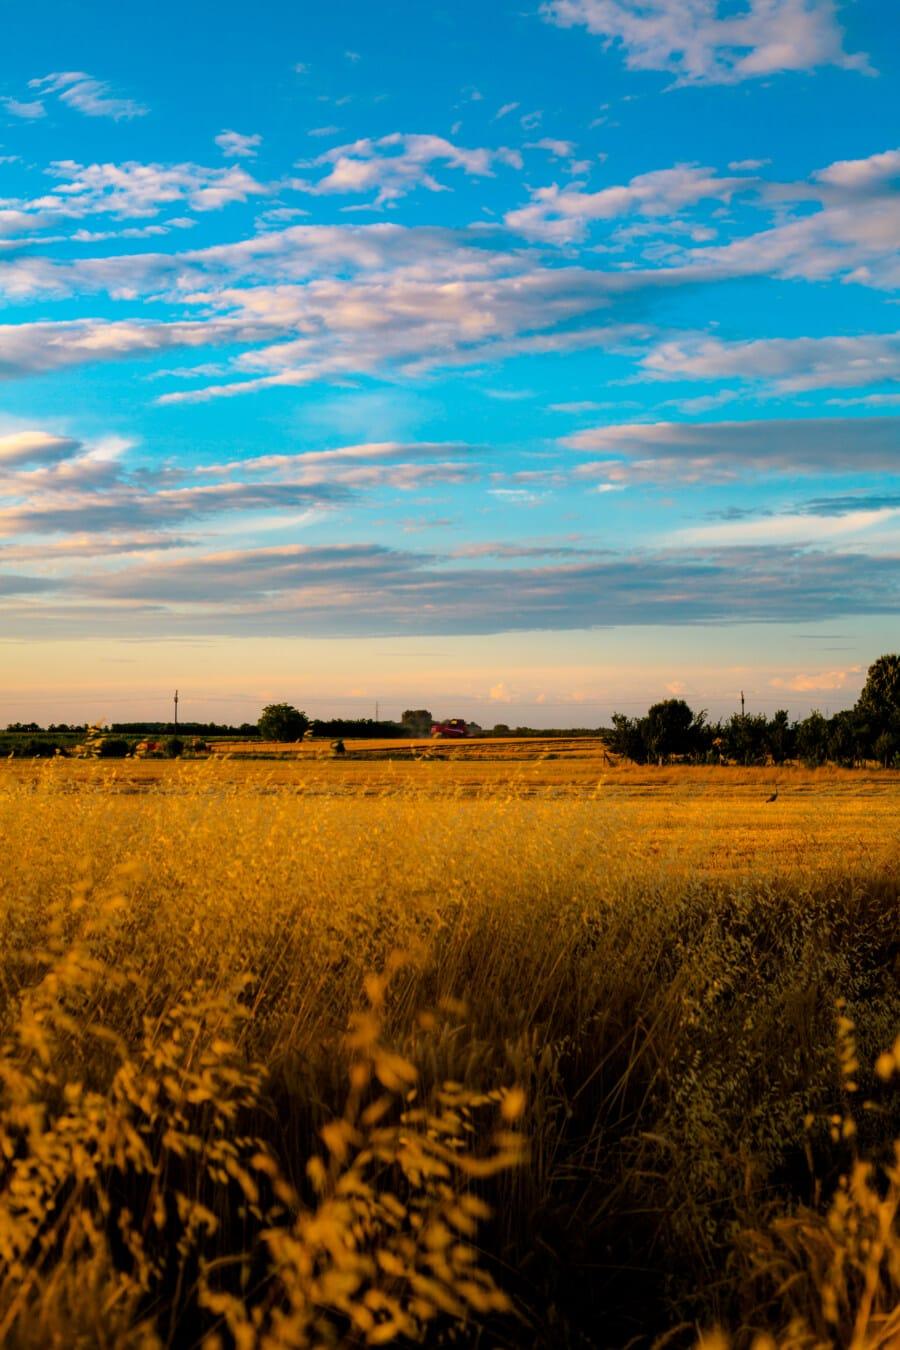 agriculture, field, grass, high, dry season, summer, dry, rural, dawn, sunset